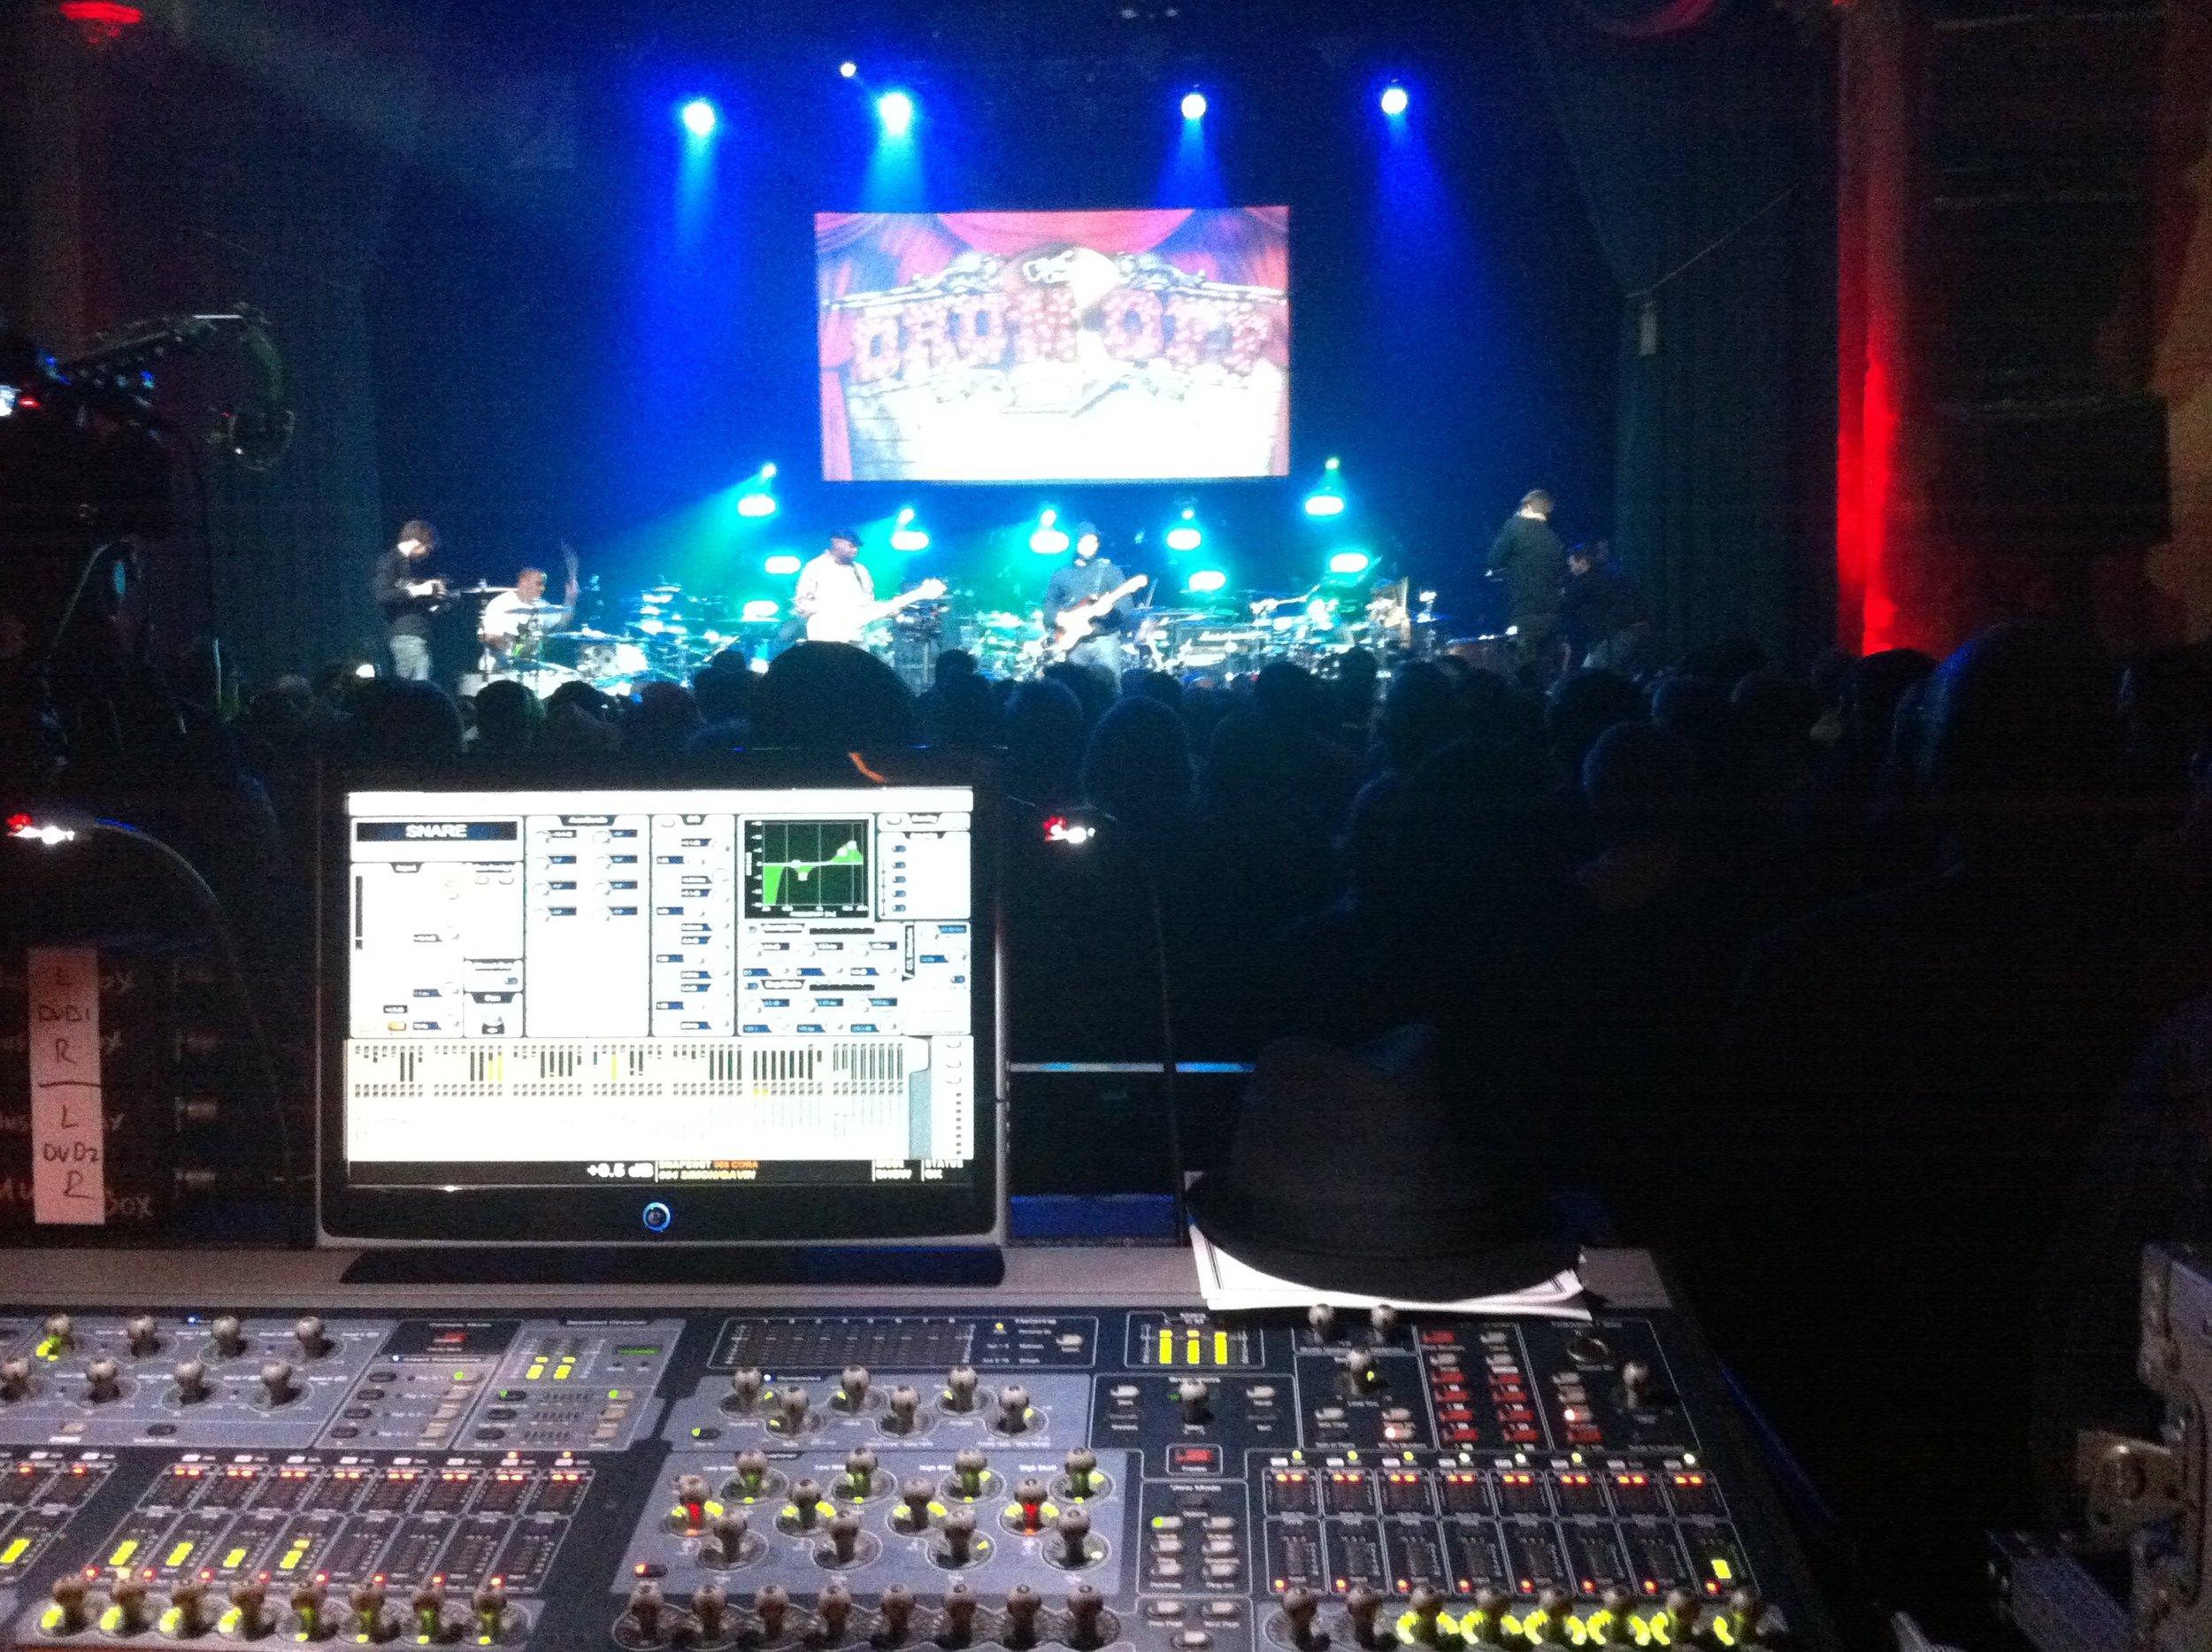 2011 Guitar Center Drum Off Finals Concert